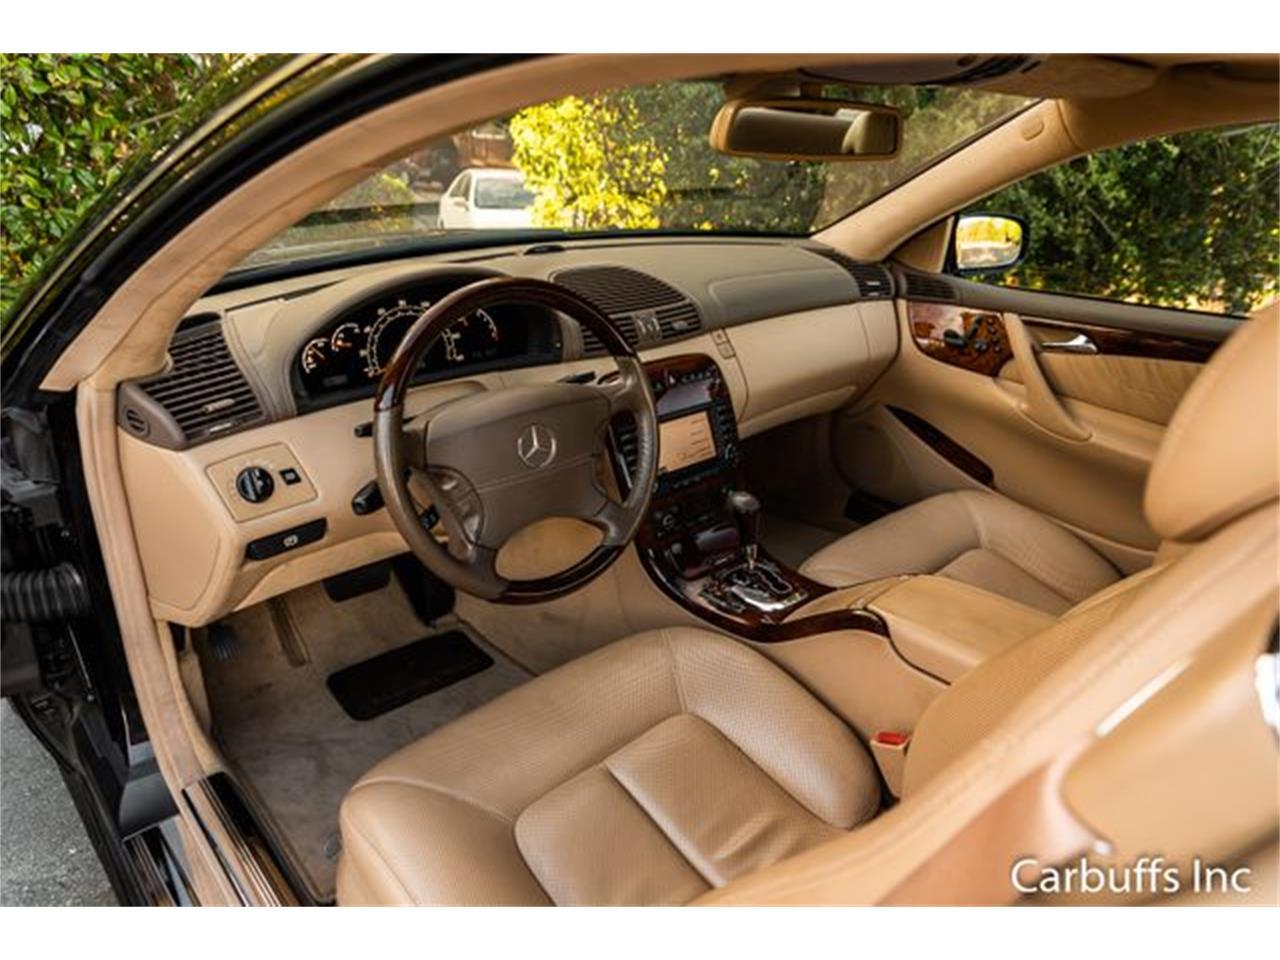 2004 Mercedes-Benz CL600 (CC-1393560) for sale in Concord, California